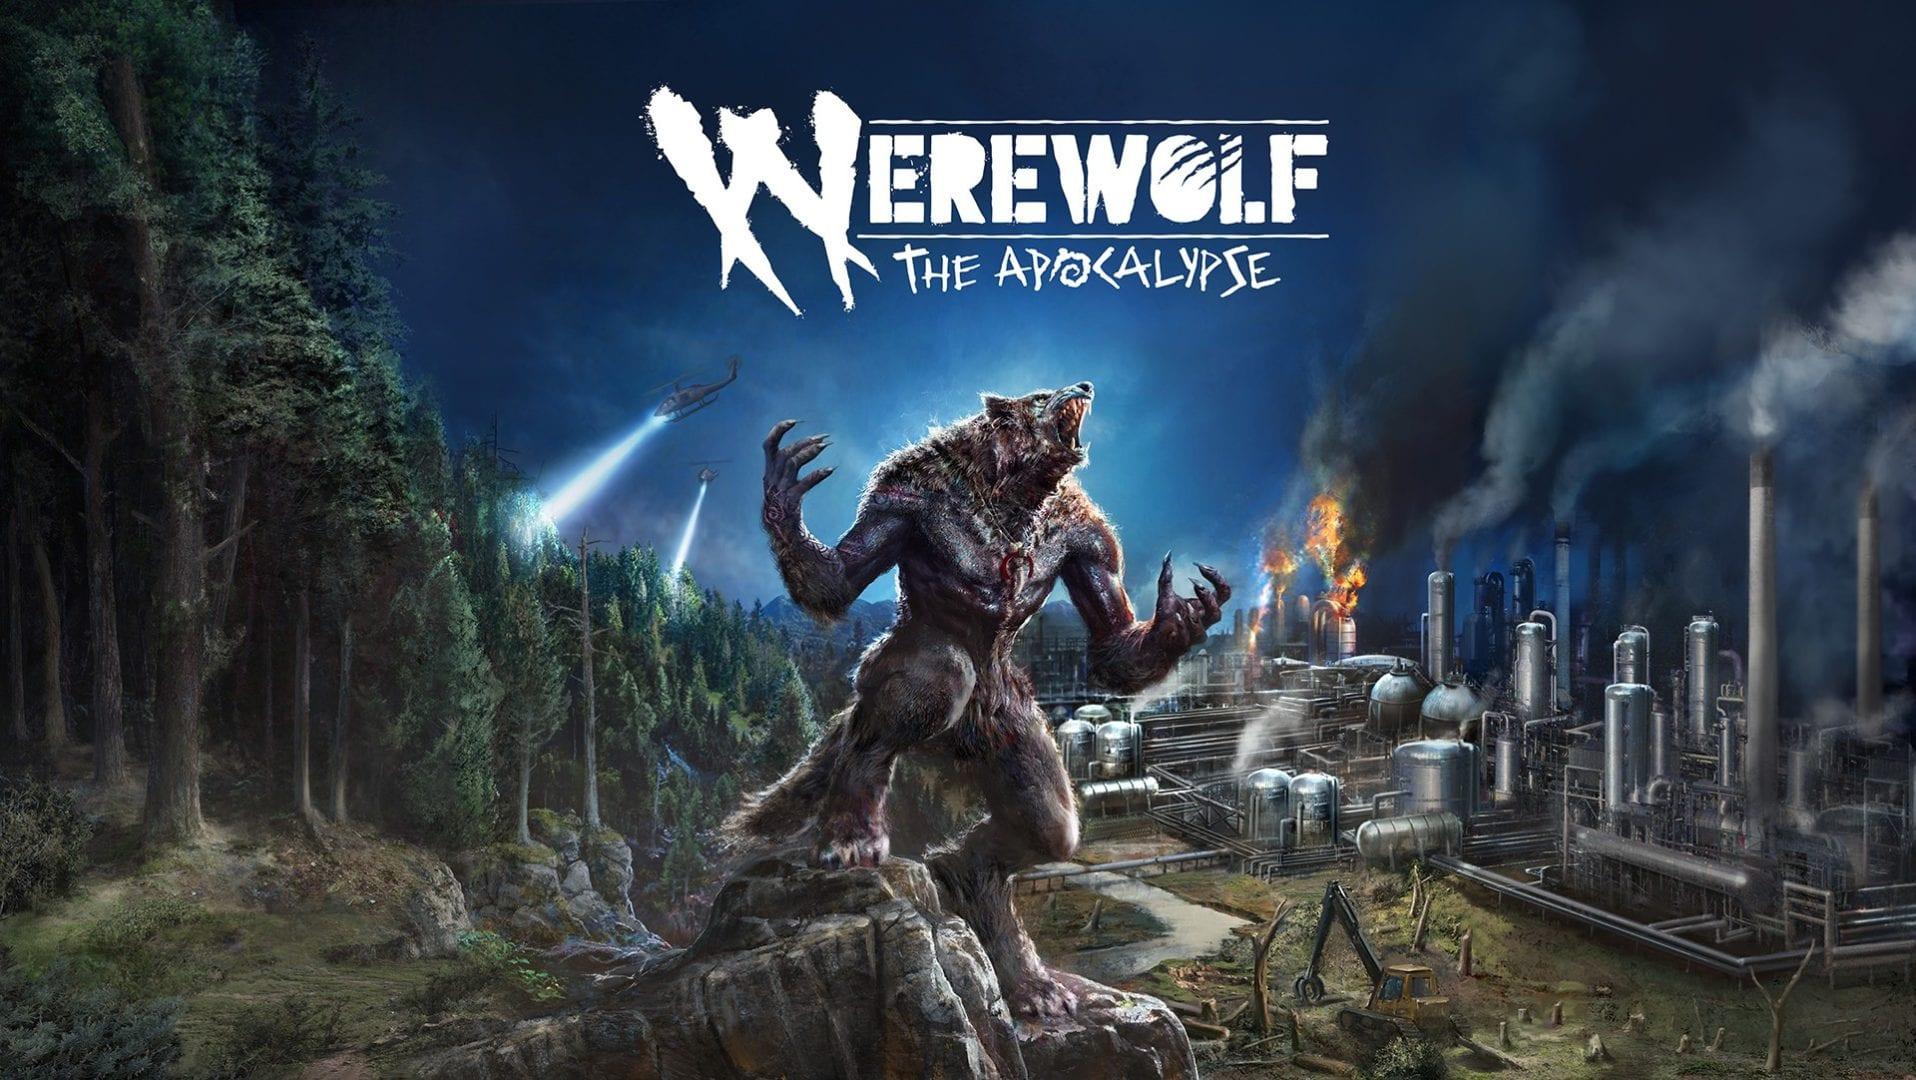 werewolf, the apocalypse